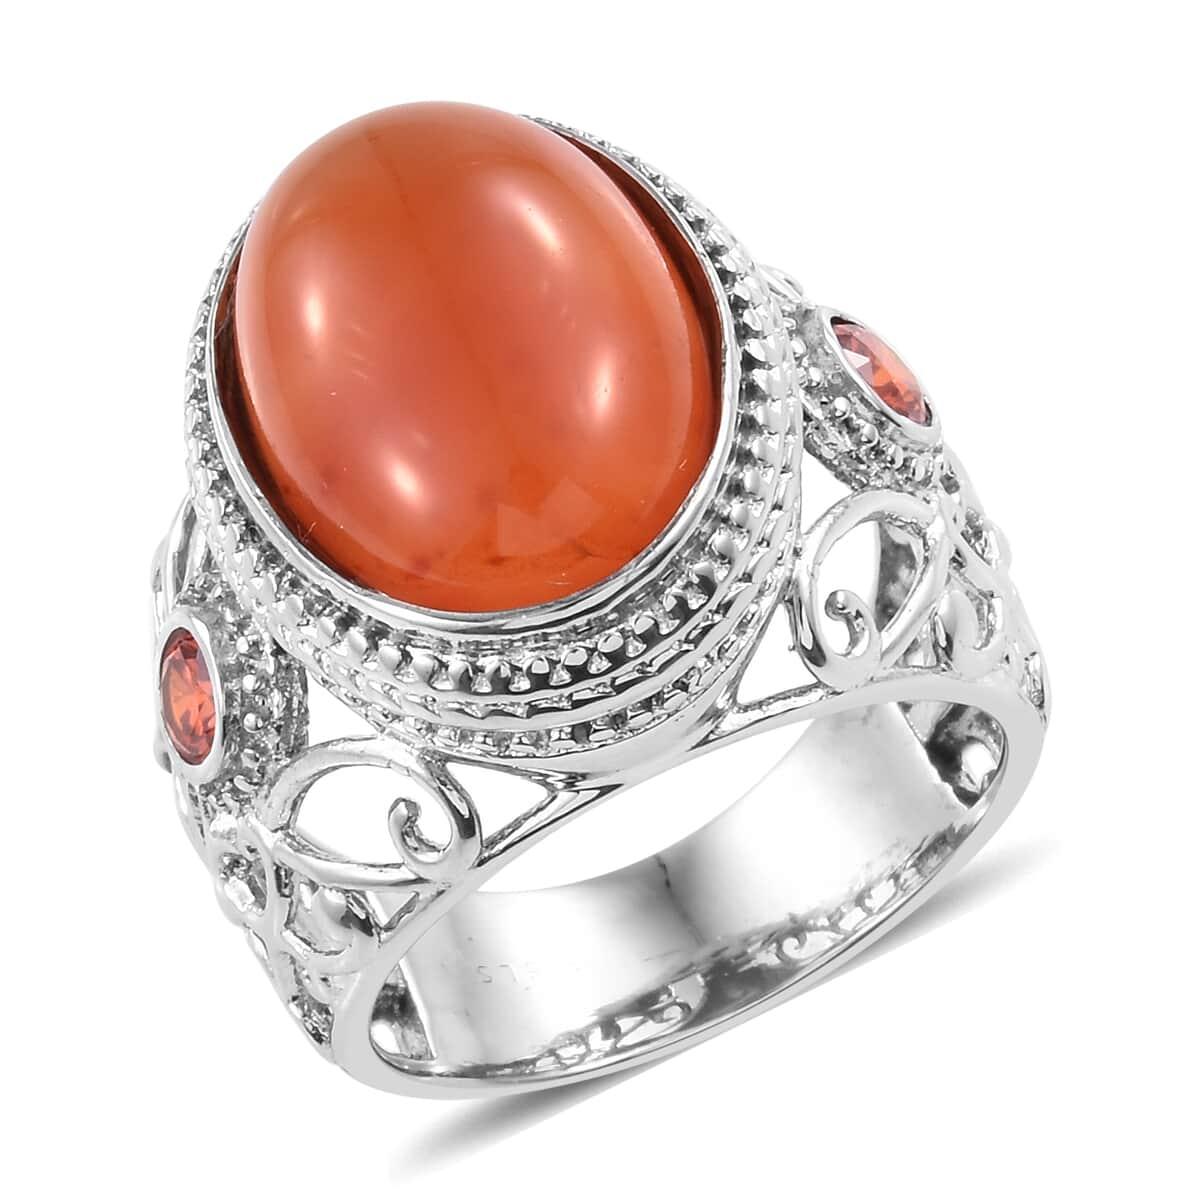 Carnelian, Orange CZ Stainless Steel Ring (Size 7 0) 12 46 ctw